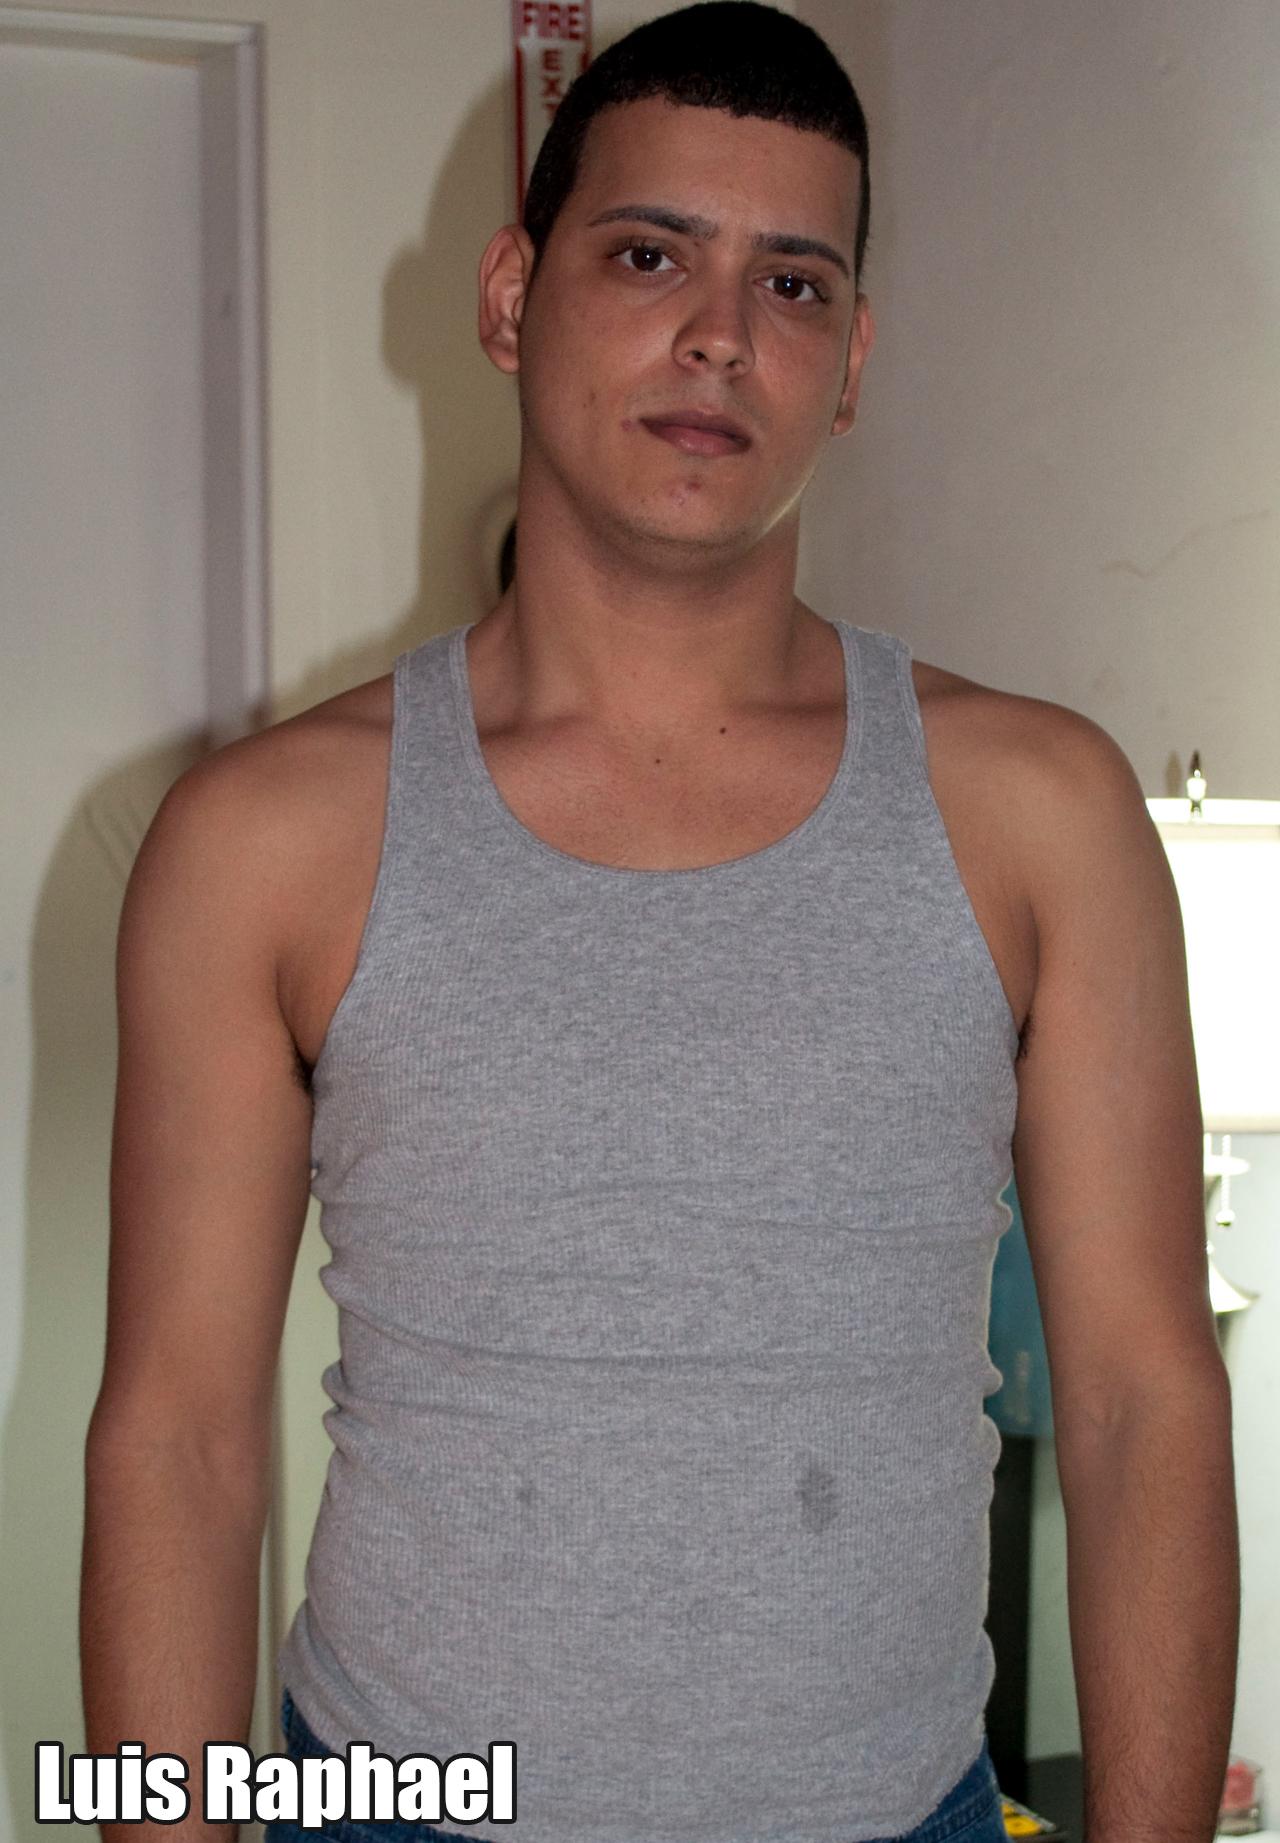 Luis Raphael